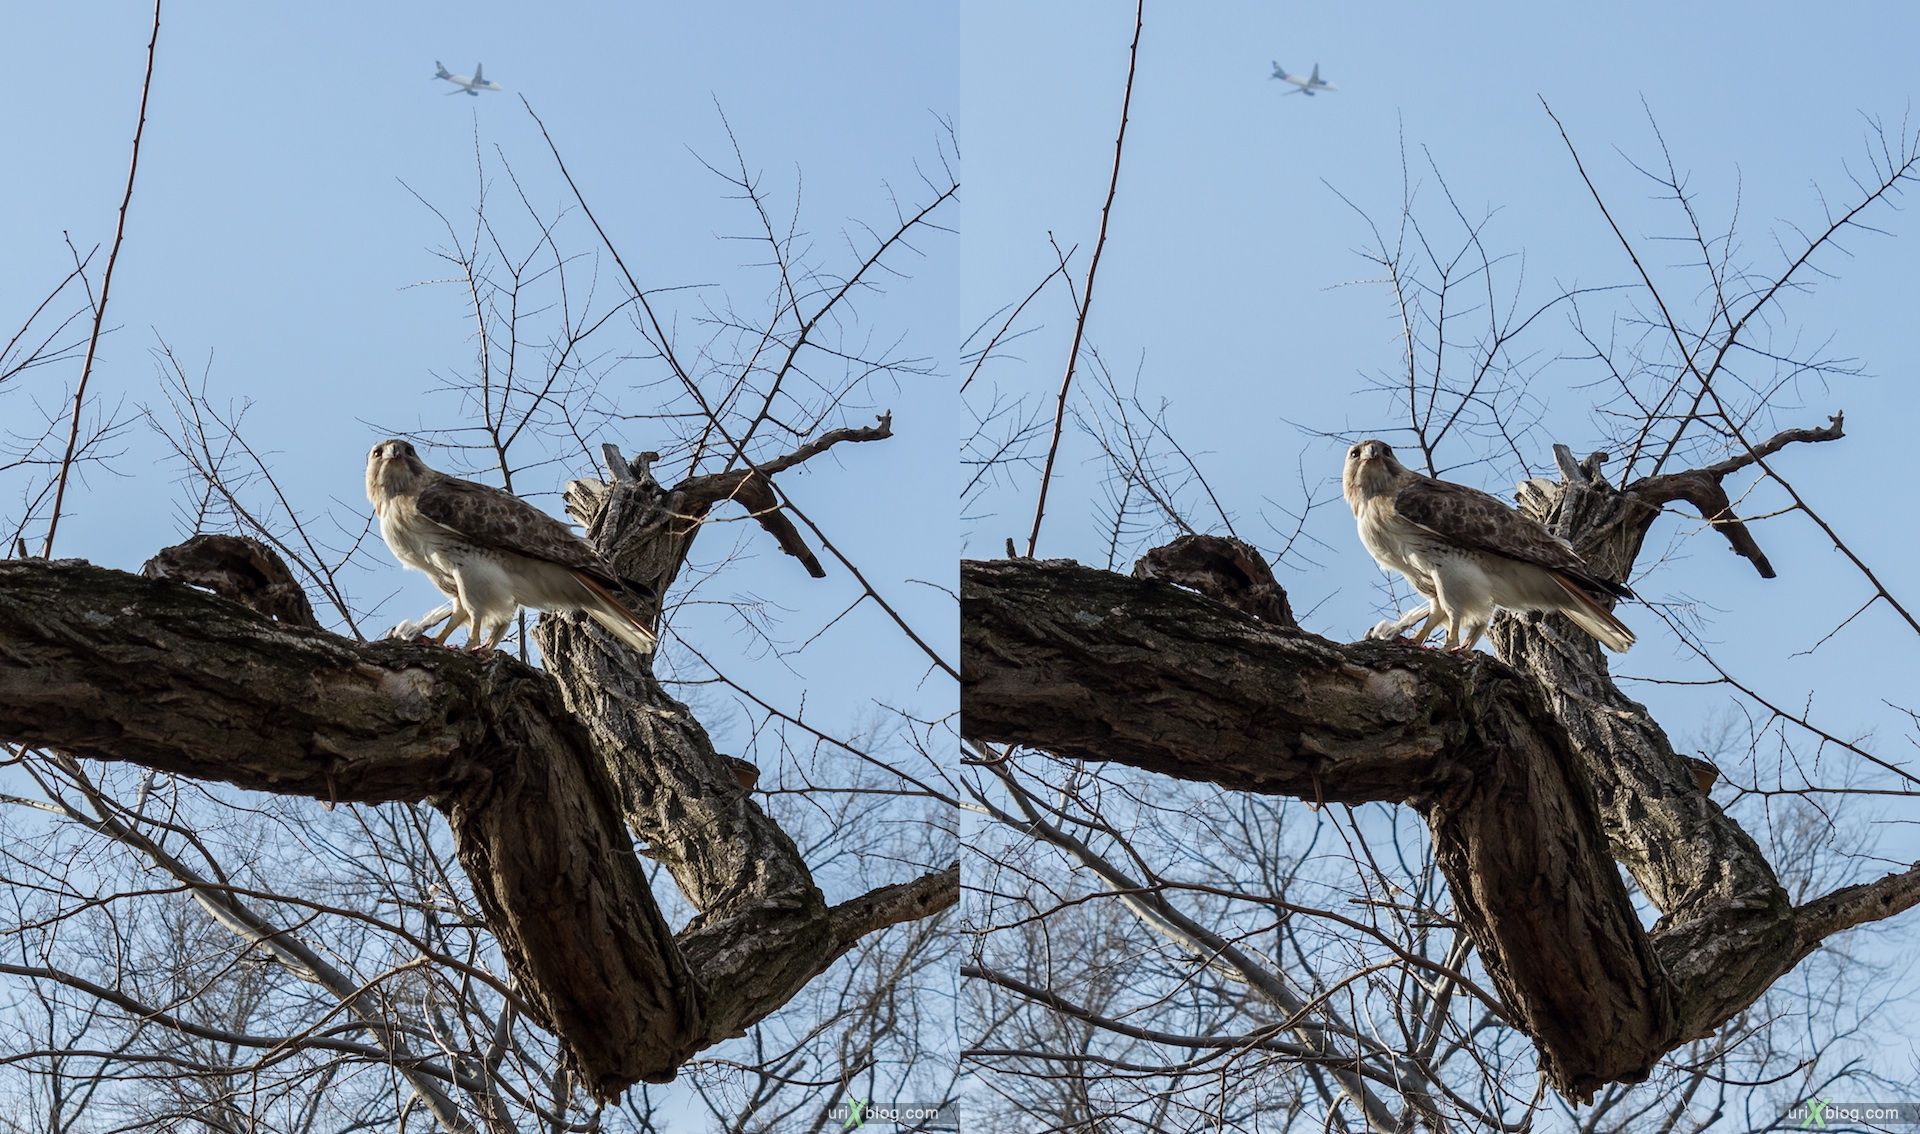 2013, Краснохвостый ястреб, сарыч, птица, орёл, Нью Йорк, Манхеттен, США, 3D, перекрёстные стереопары, стерео, стереопара, стереопары